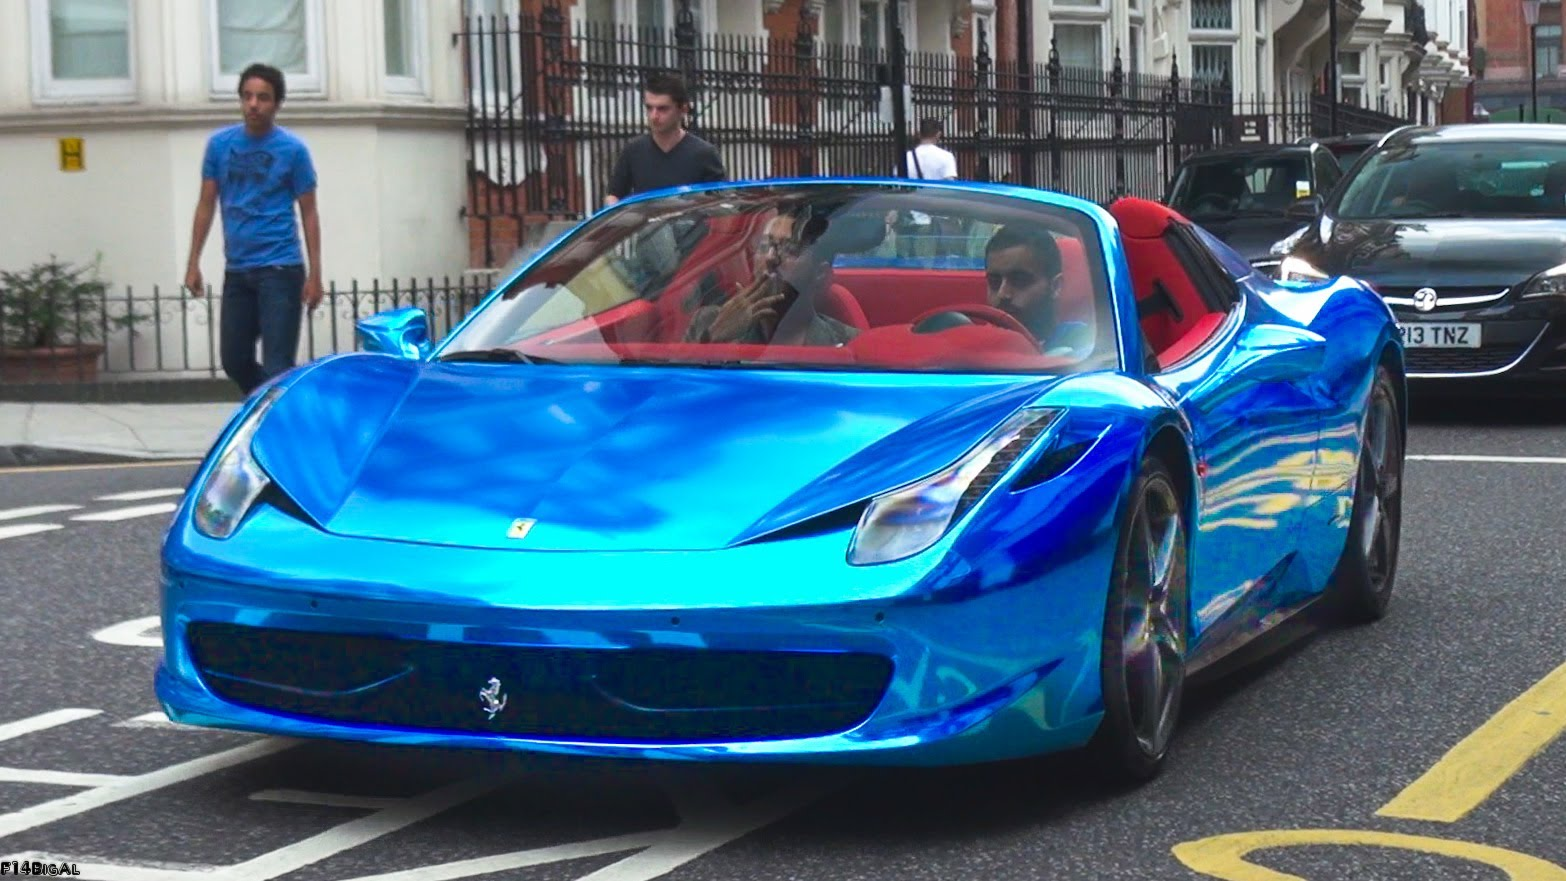 black and blue ferrari 34 free hd wallpaper - Ferrari 458 Blue Wallpaper